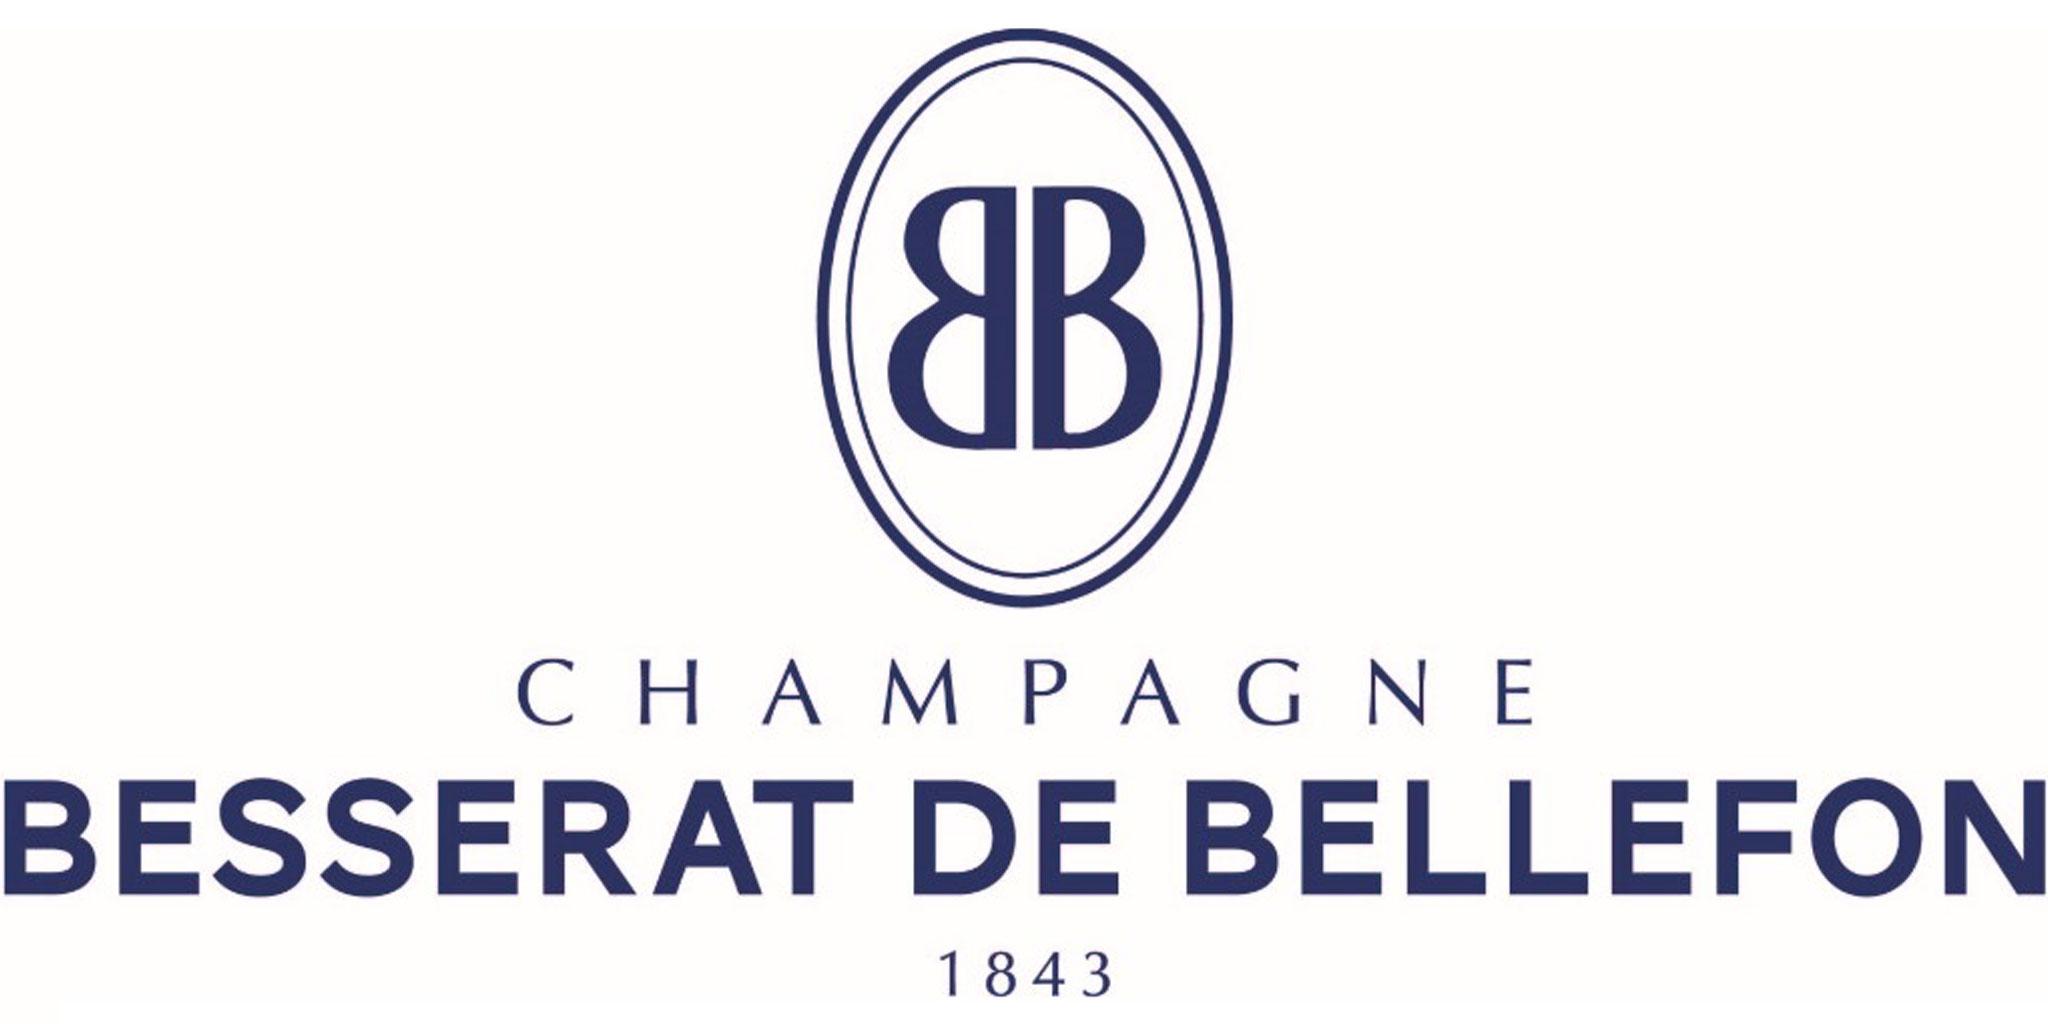 Besserat de Bellefon champagne logo